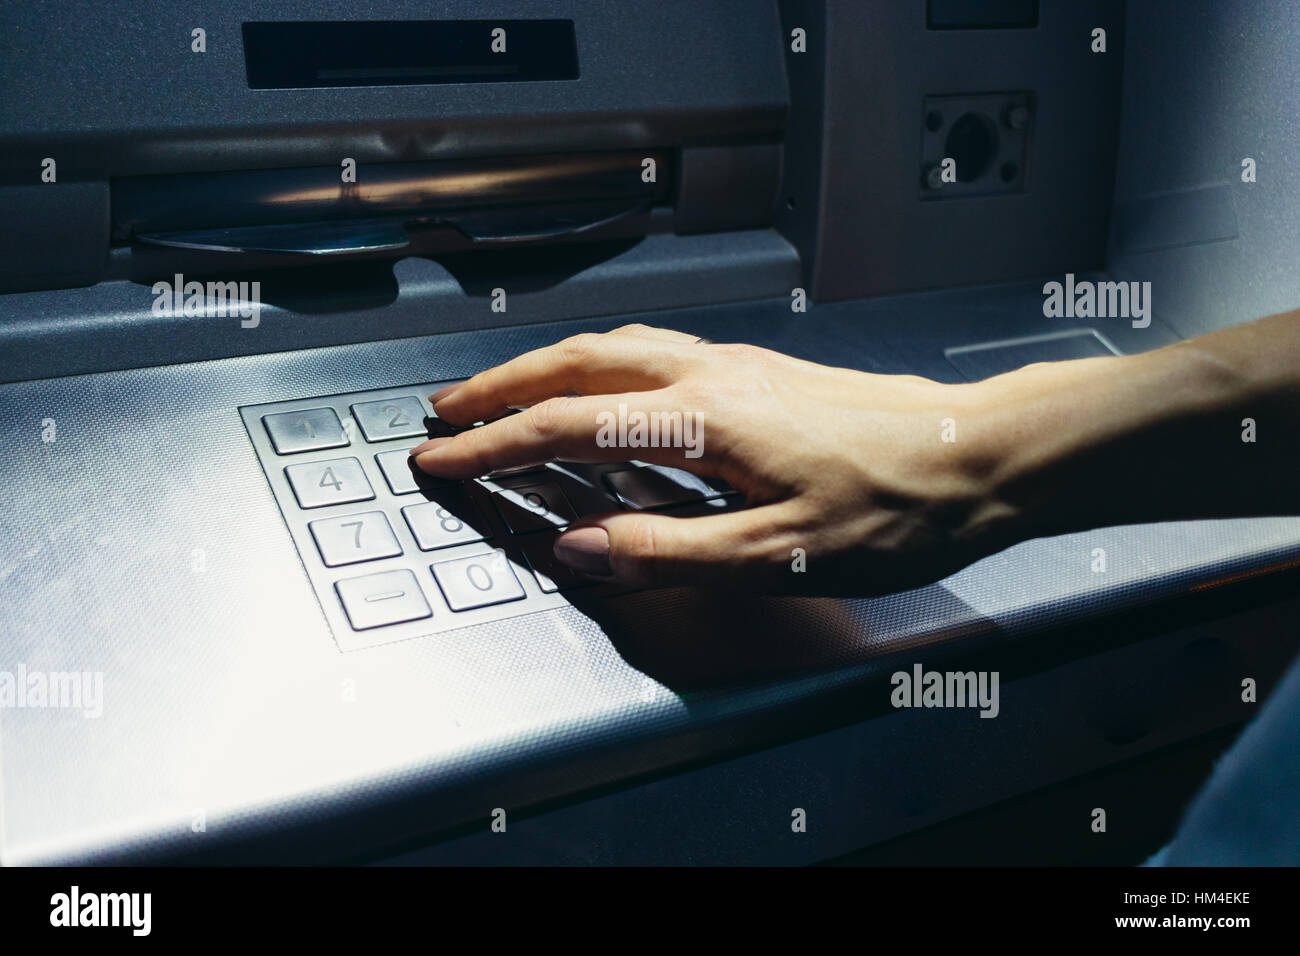 Secret Code Stock Photos & Secret Code Stock Images - Alamy